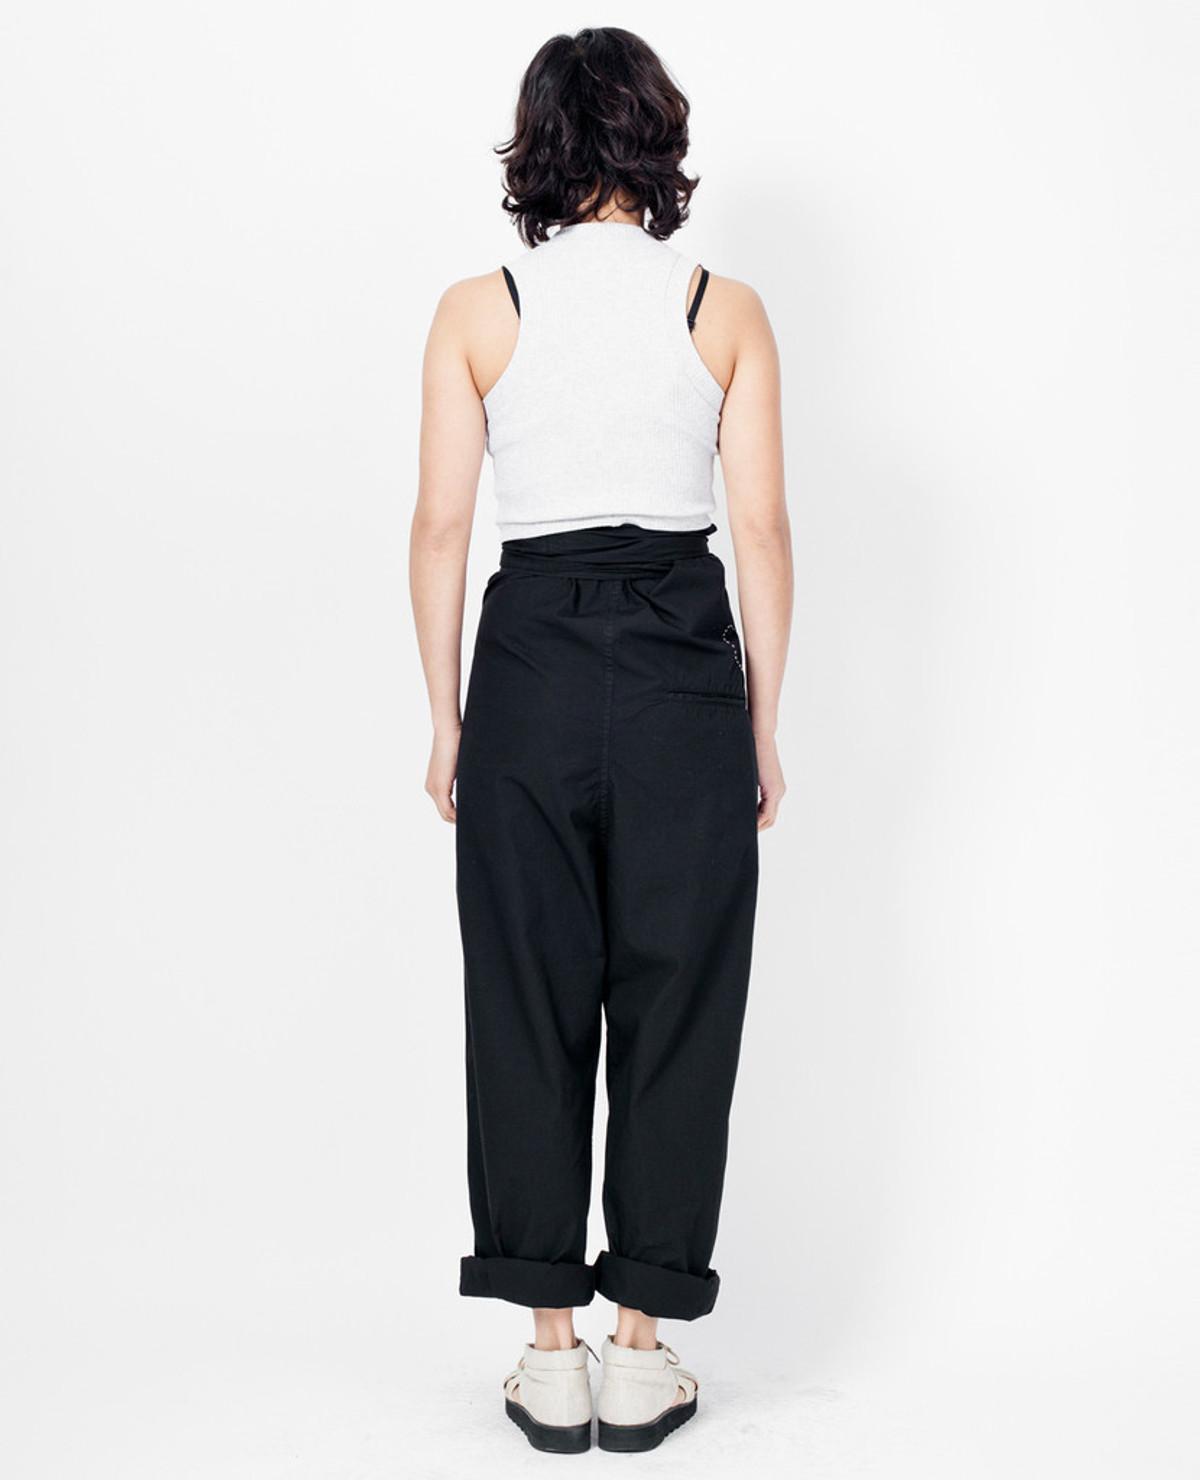 Cosmic Wonder Basic Pants - Black